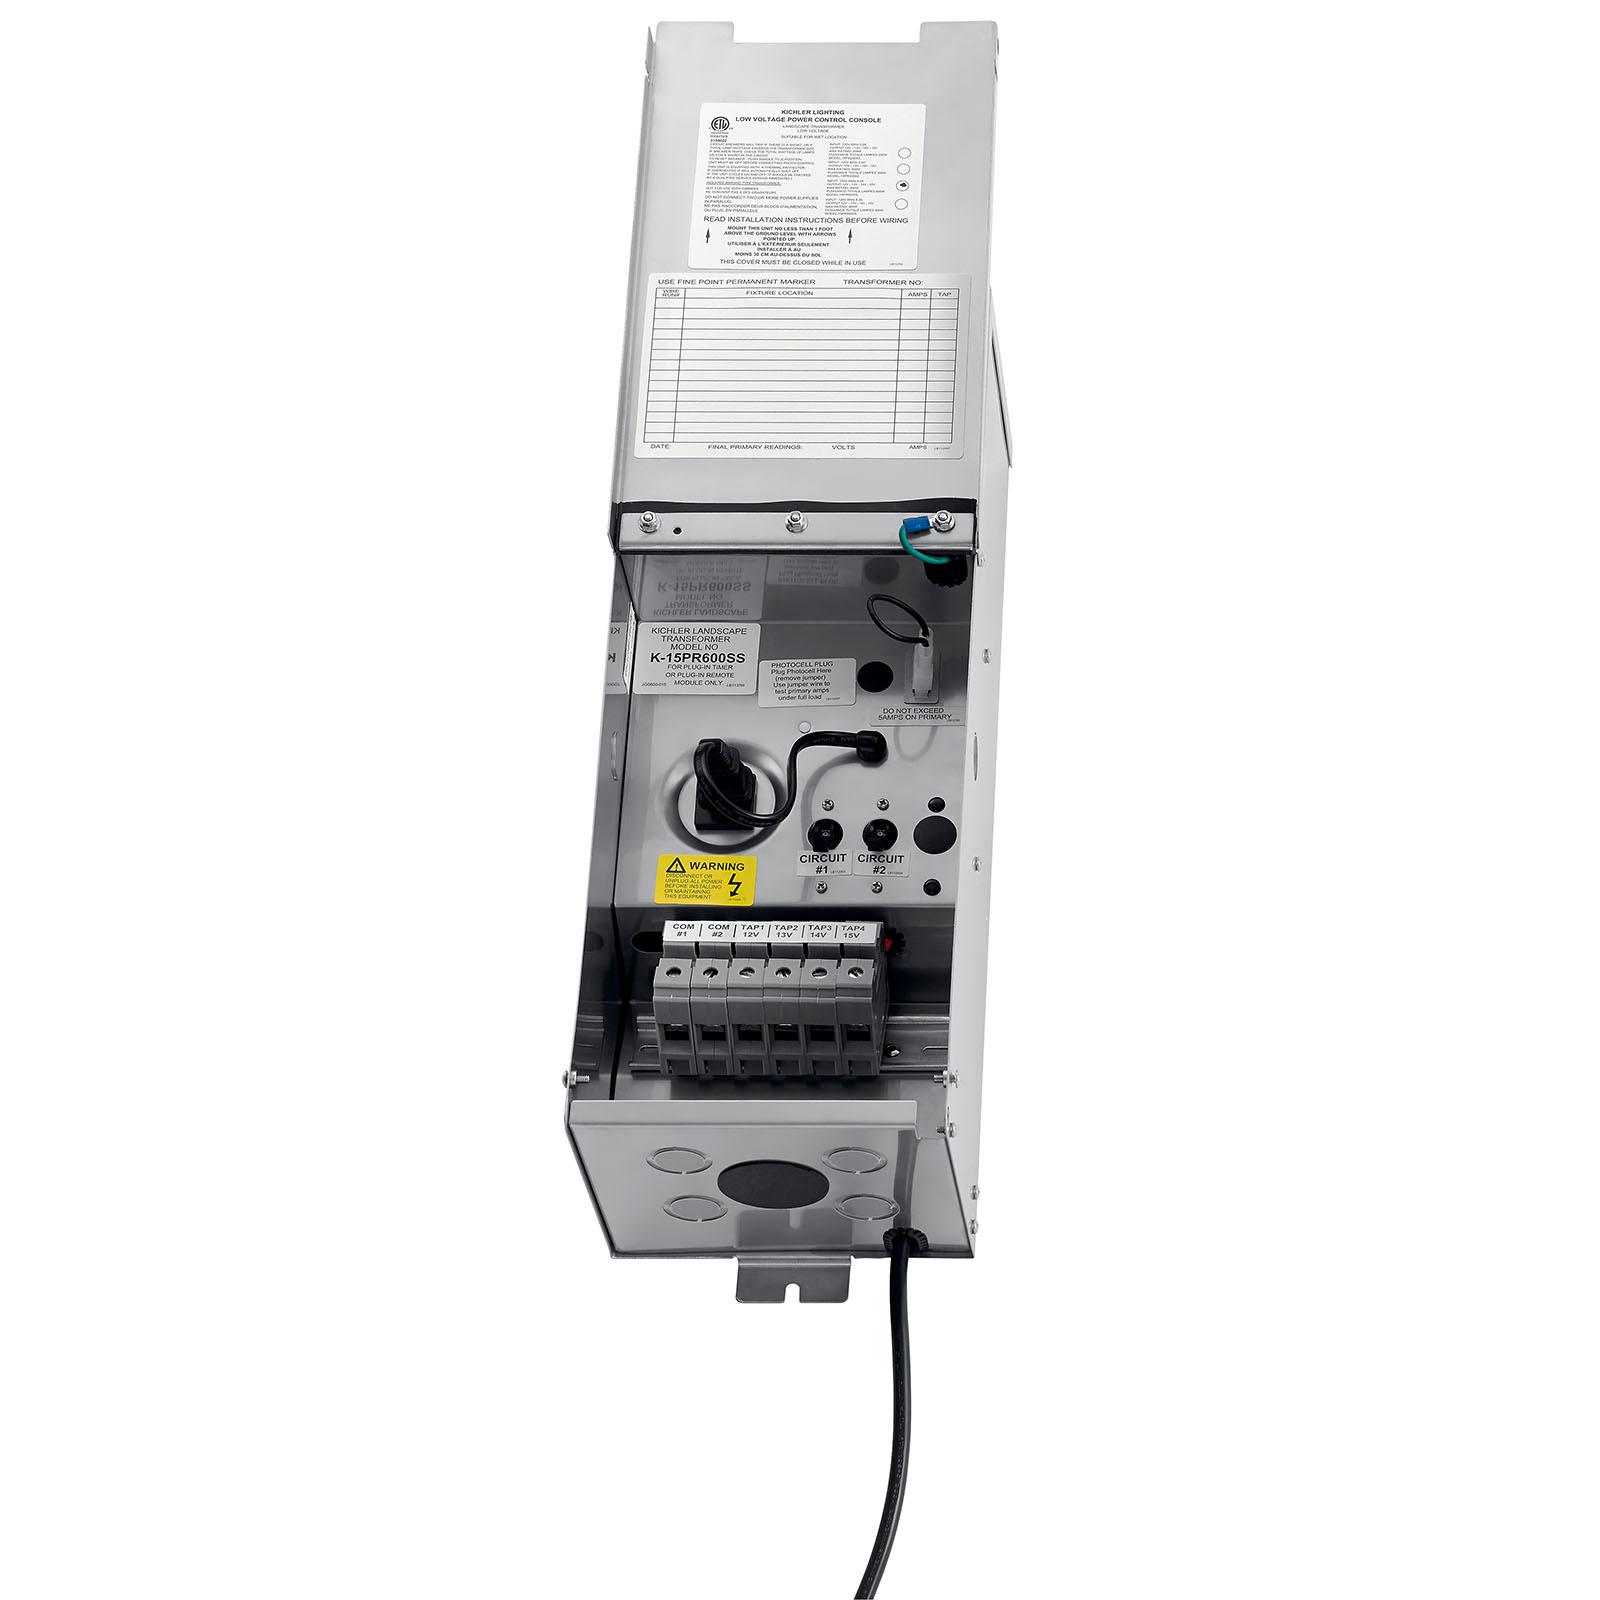 KIC15PR600SS